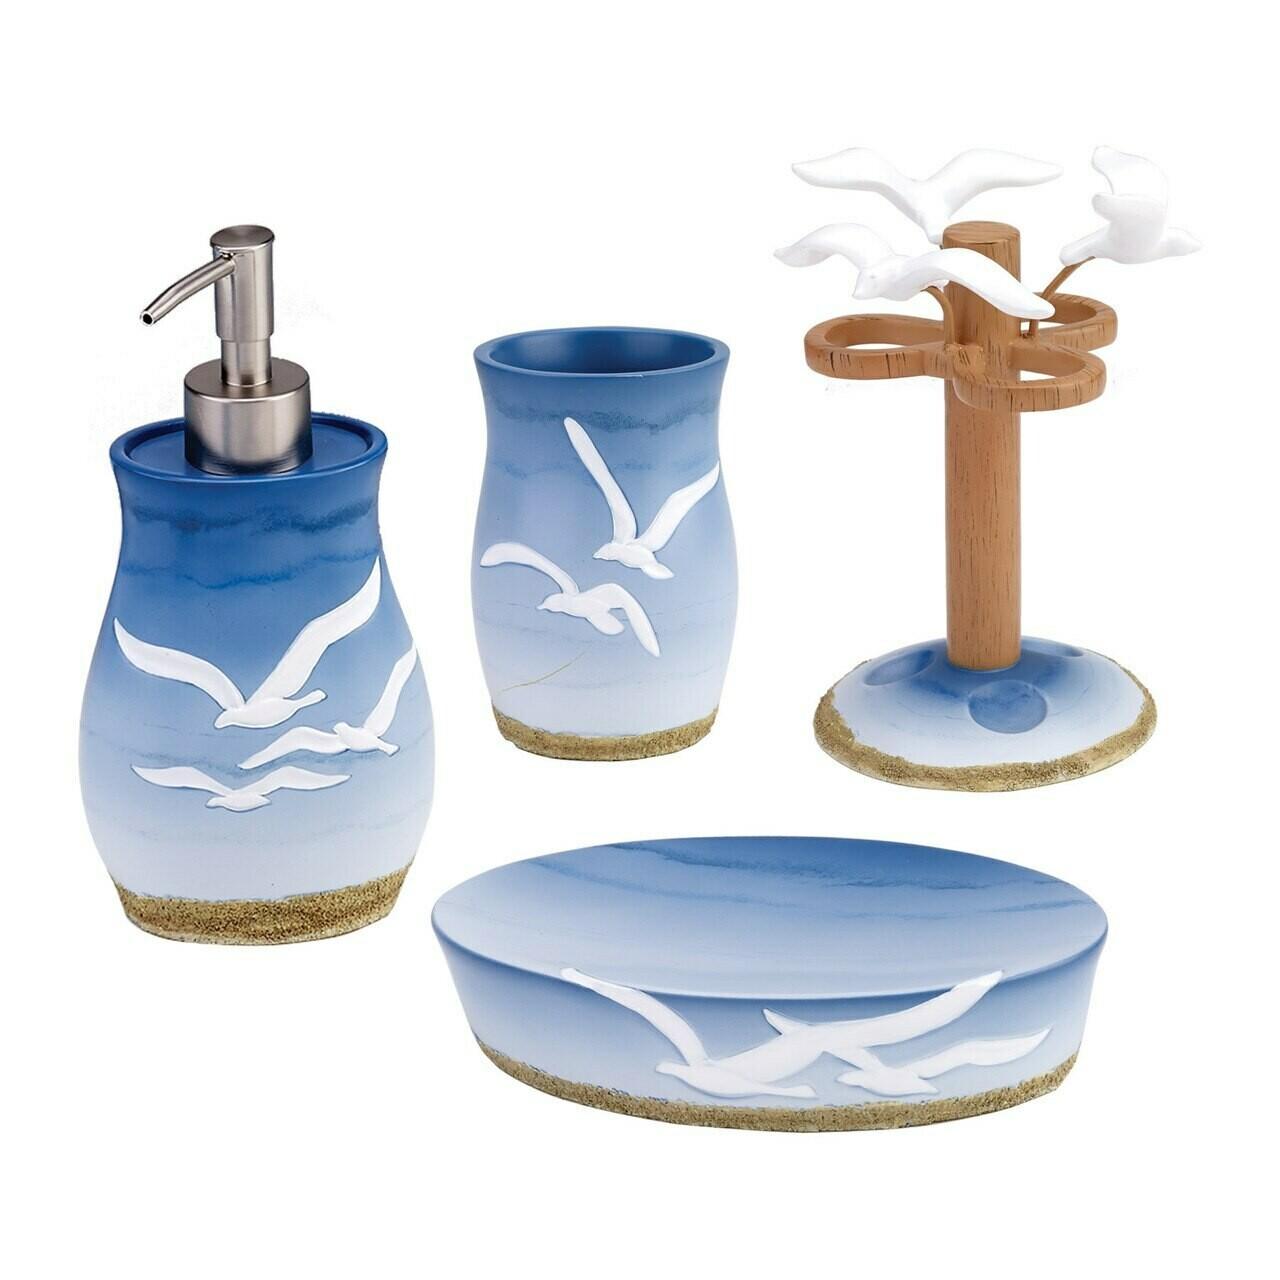 Seagulls Soap Dispenser